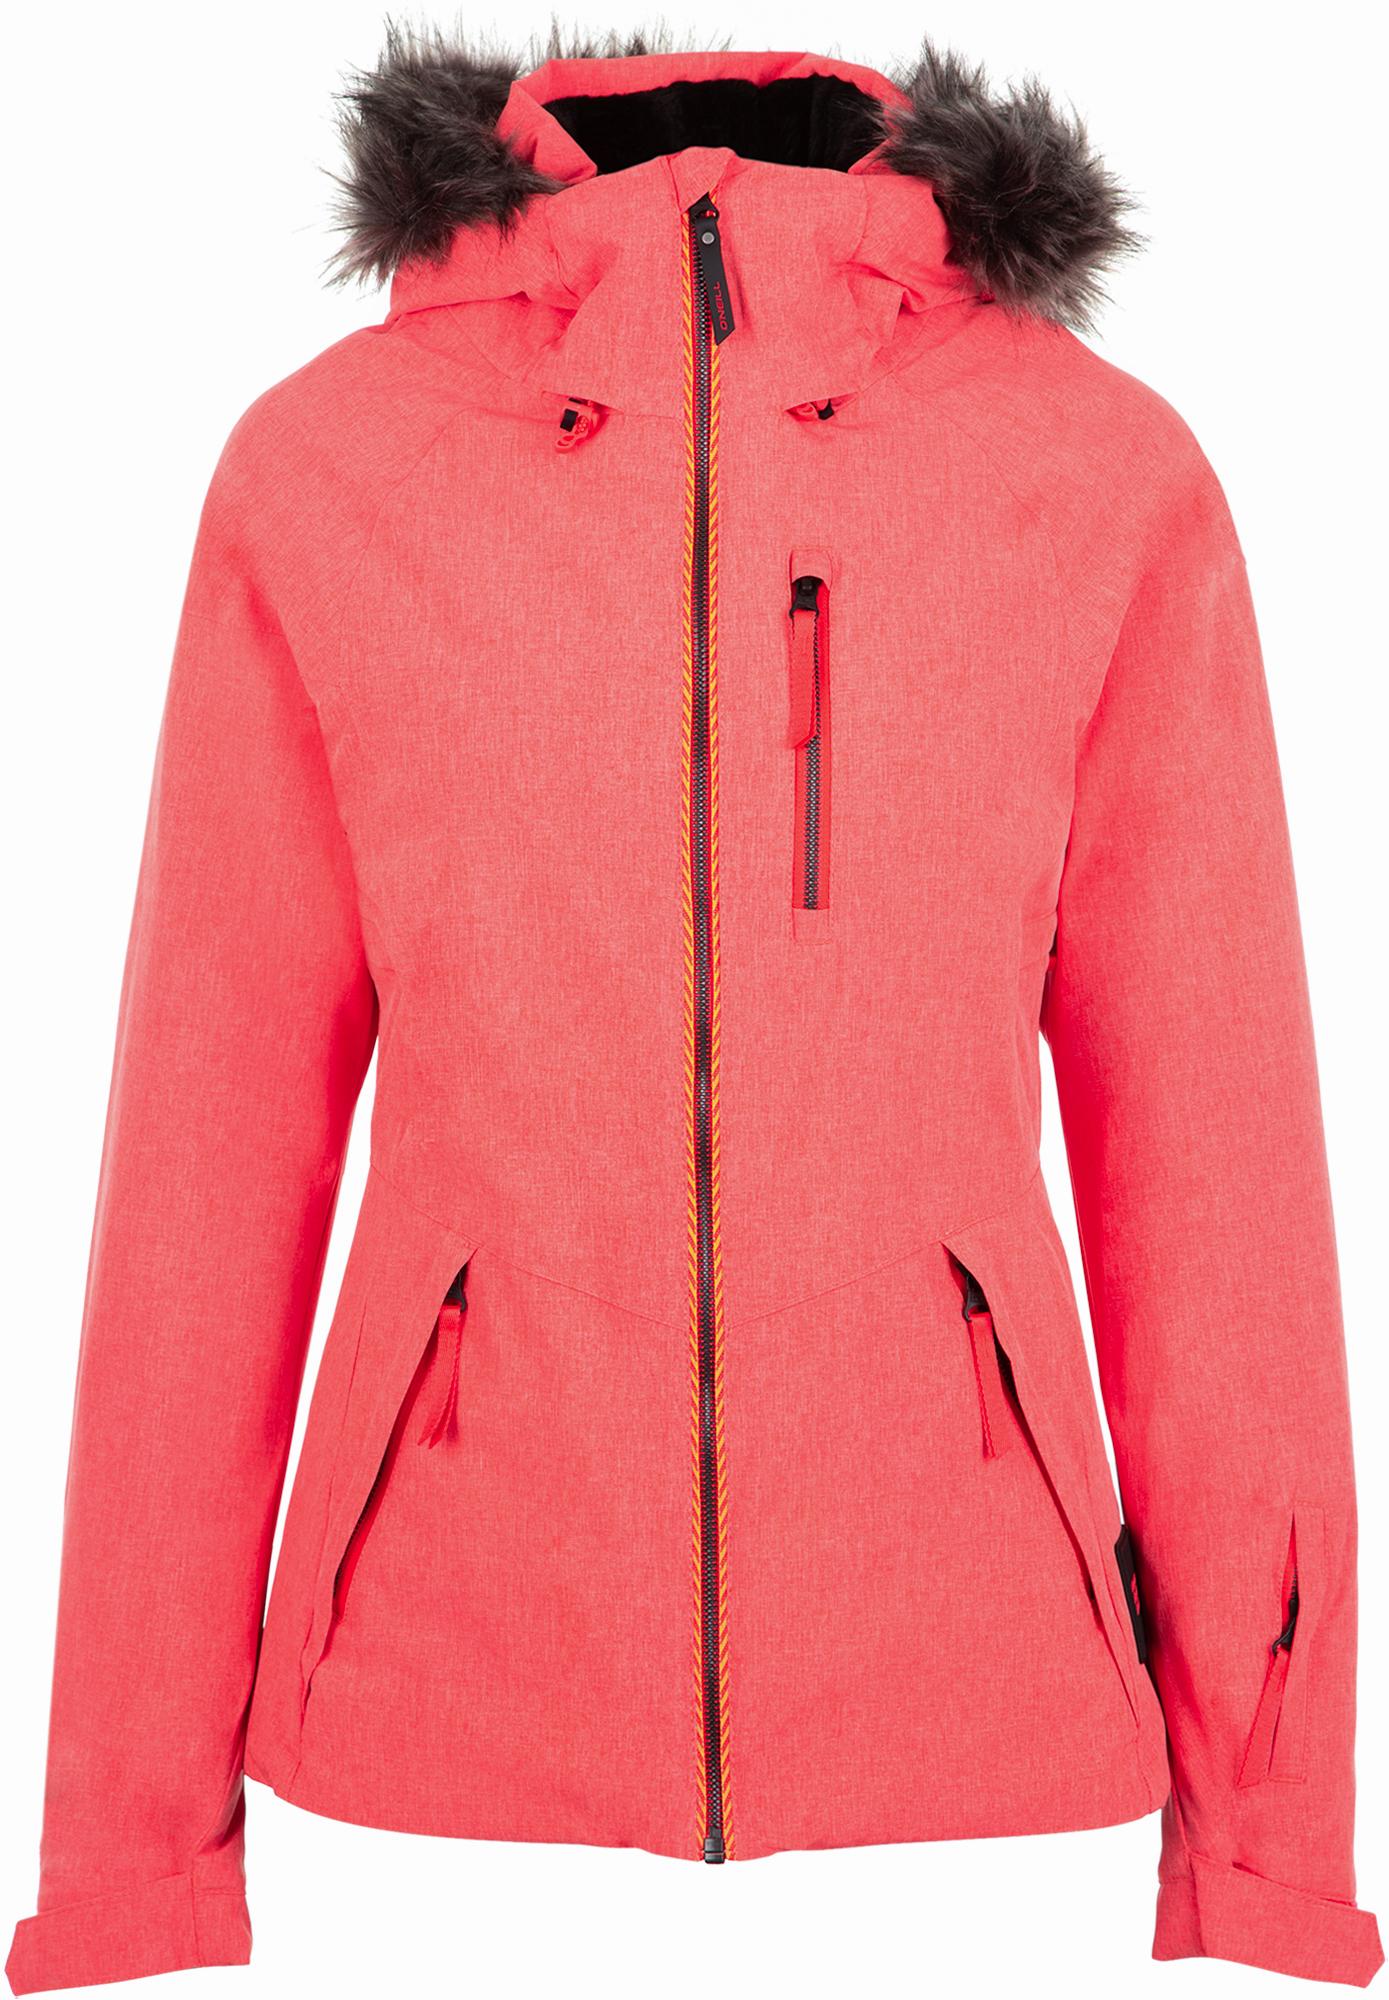 O'Neill Куртка утепленная женская O'Neill Pw Vauxite, размер 42-44 o neill куртка утепленная женская o neill pw hybrid cluster iii размер 48 50